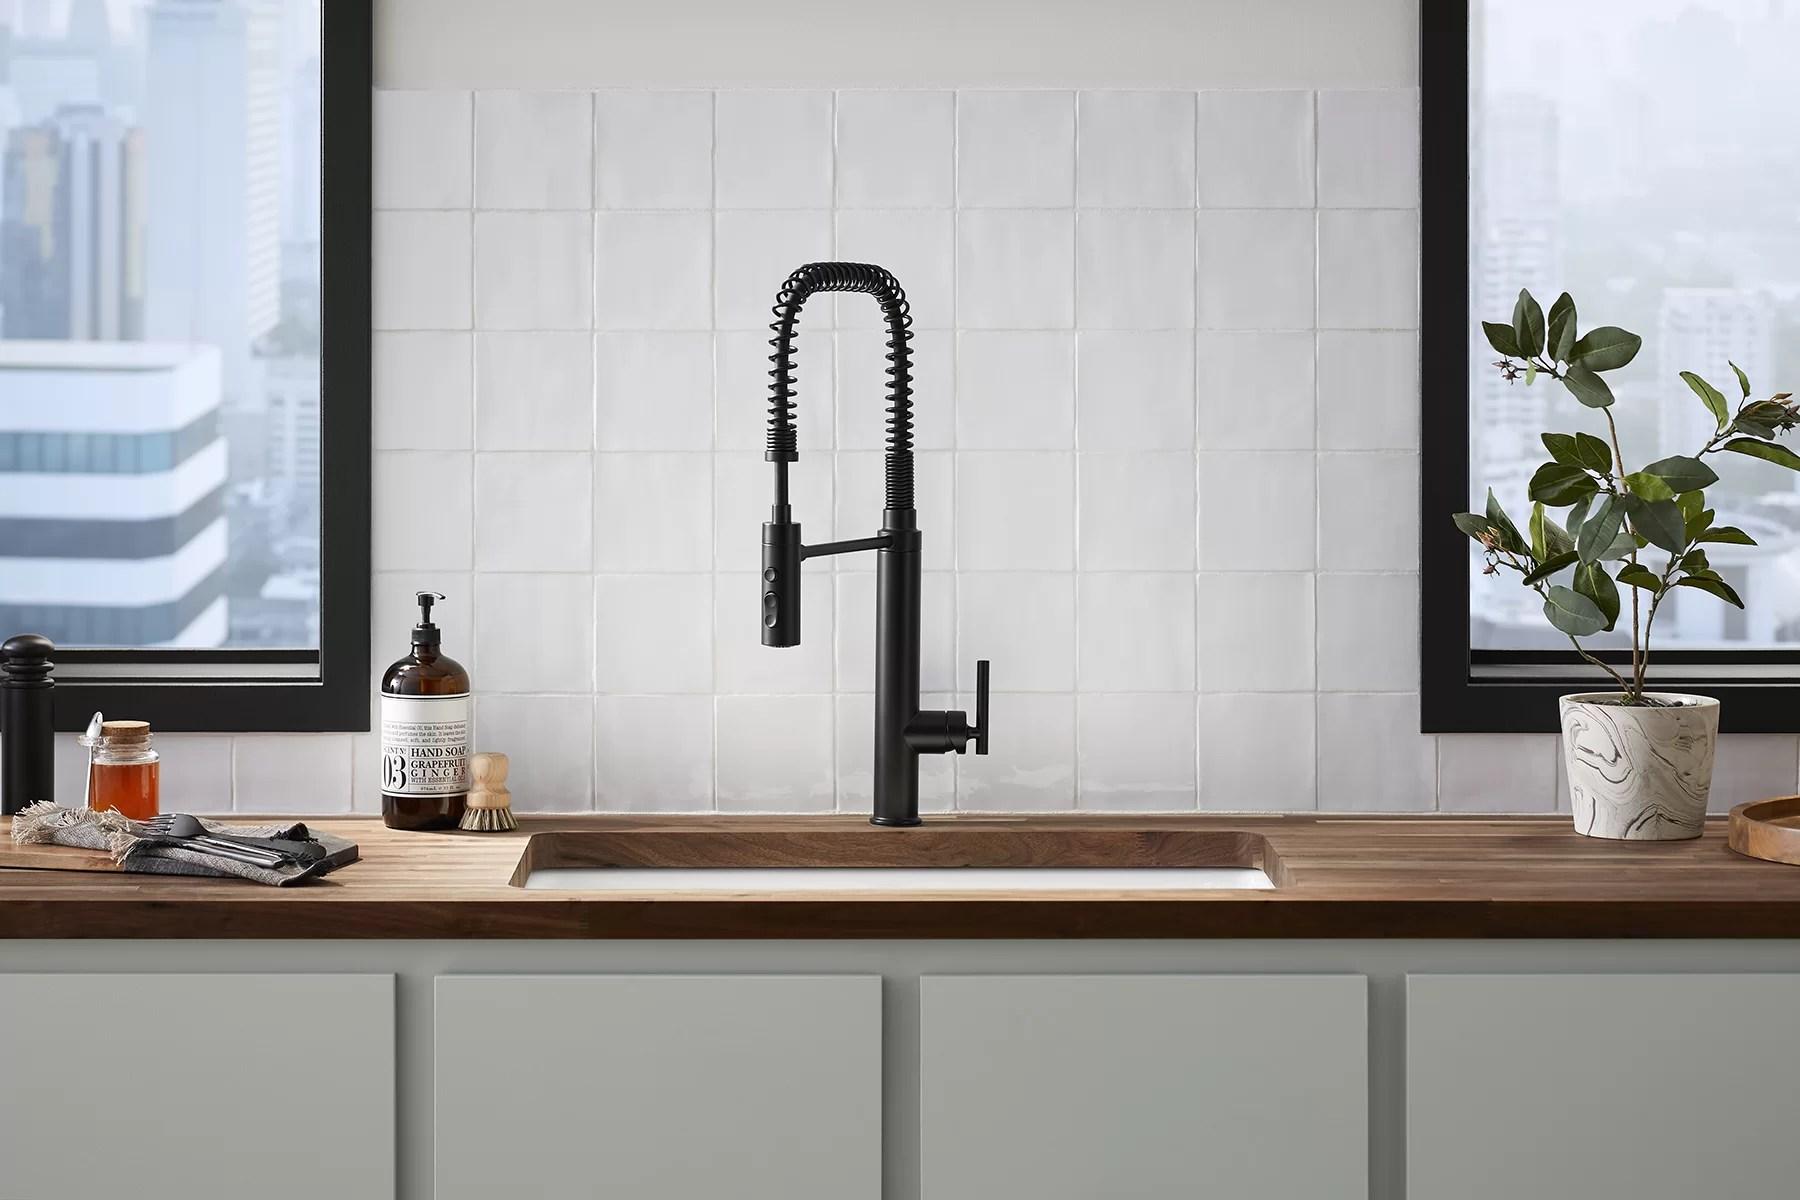 purist semiprofessional kitchen sink faucet